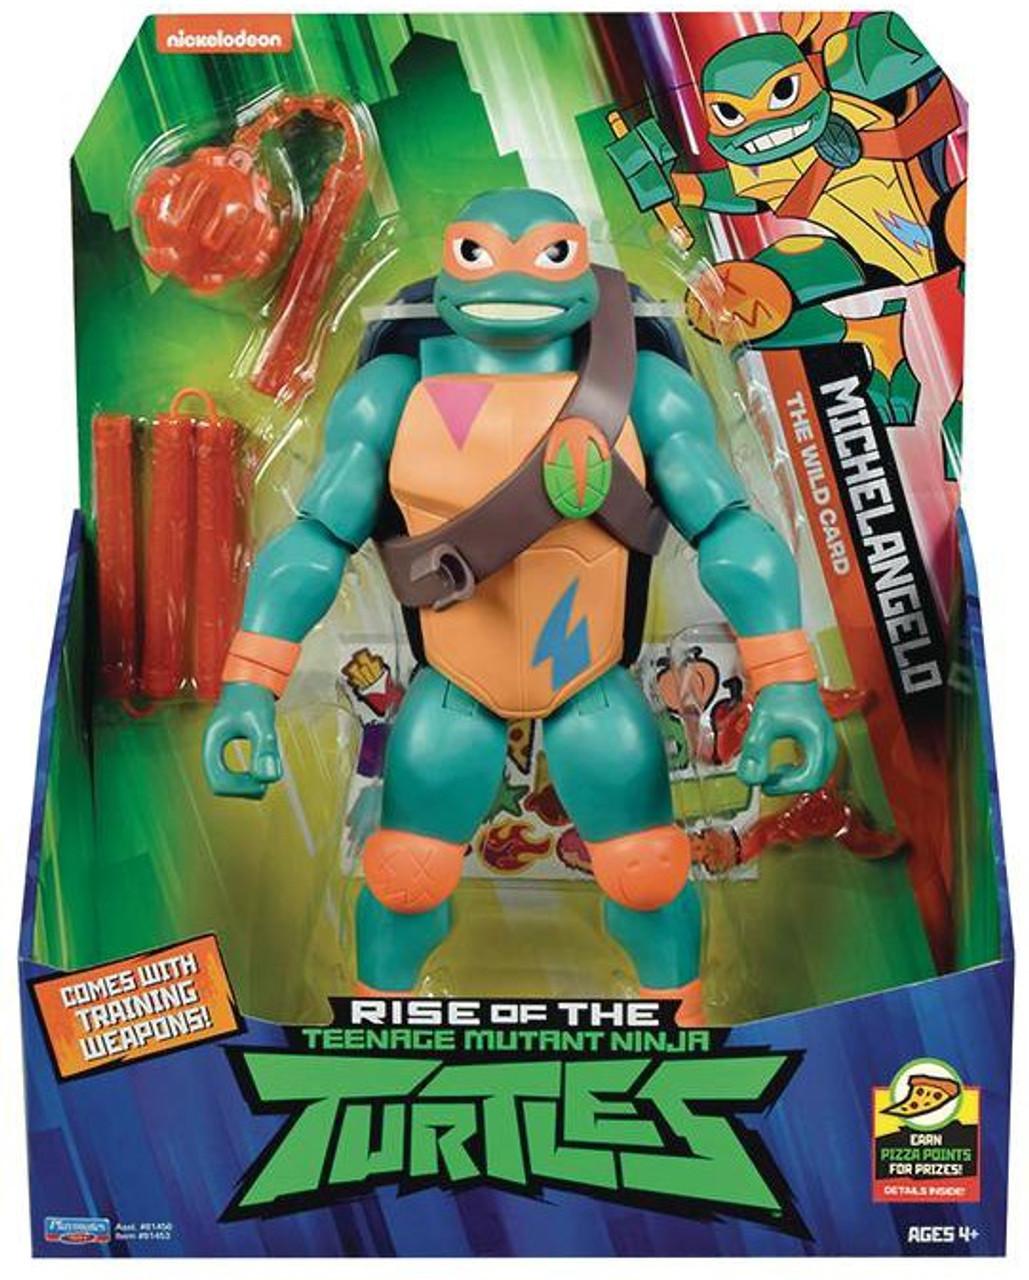 Teenage Mutant Ninja Turtles Nickelodeon Rise of the TMNT Michelangelo  Giant Action Figure [Kusari-Fundo & Throwing Stars]